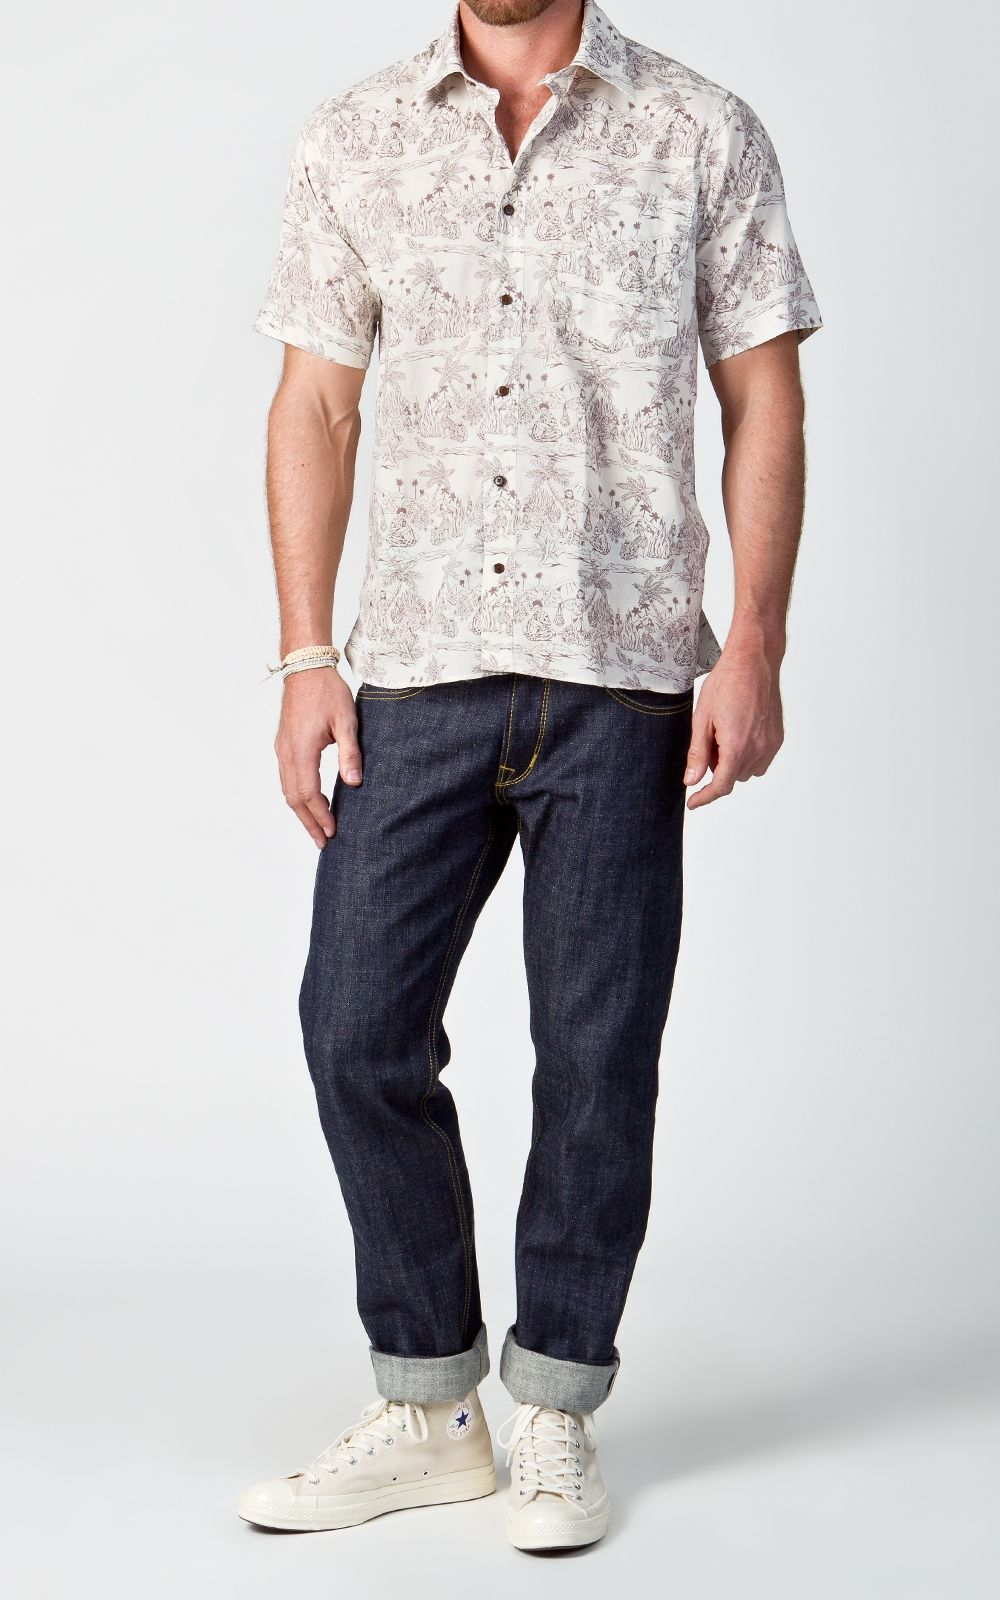 Pike Brothers 1937 Roamer Shirt Short Sleeve Brown Malahi